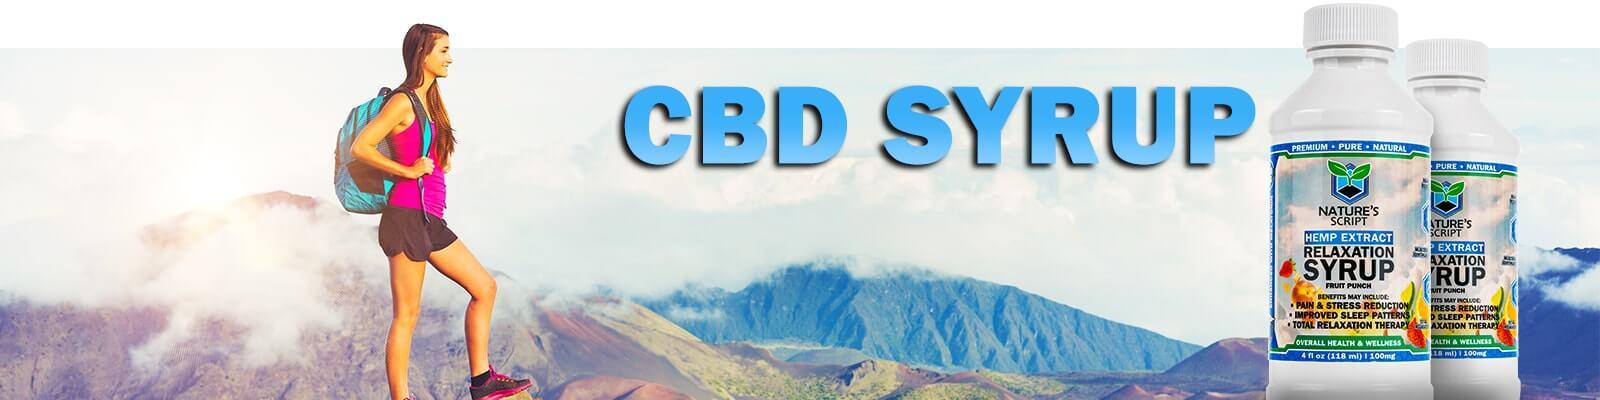 CBD Syrup banner